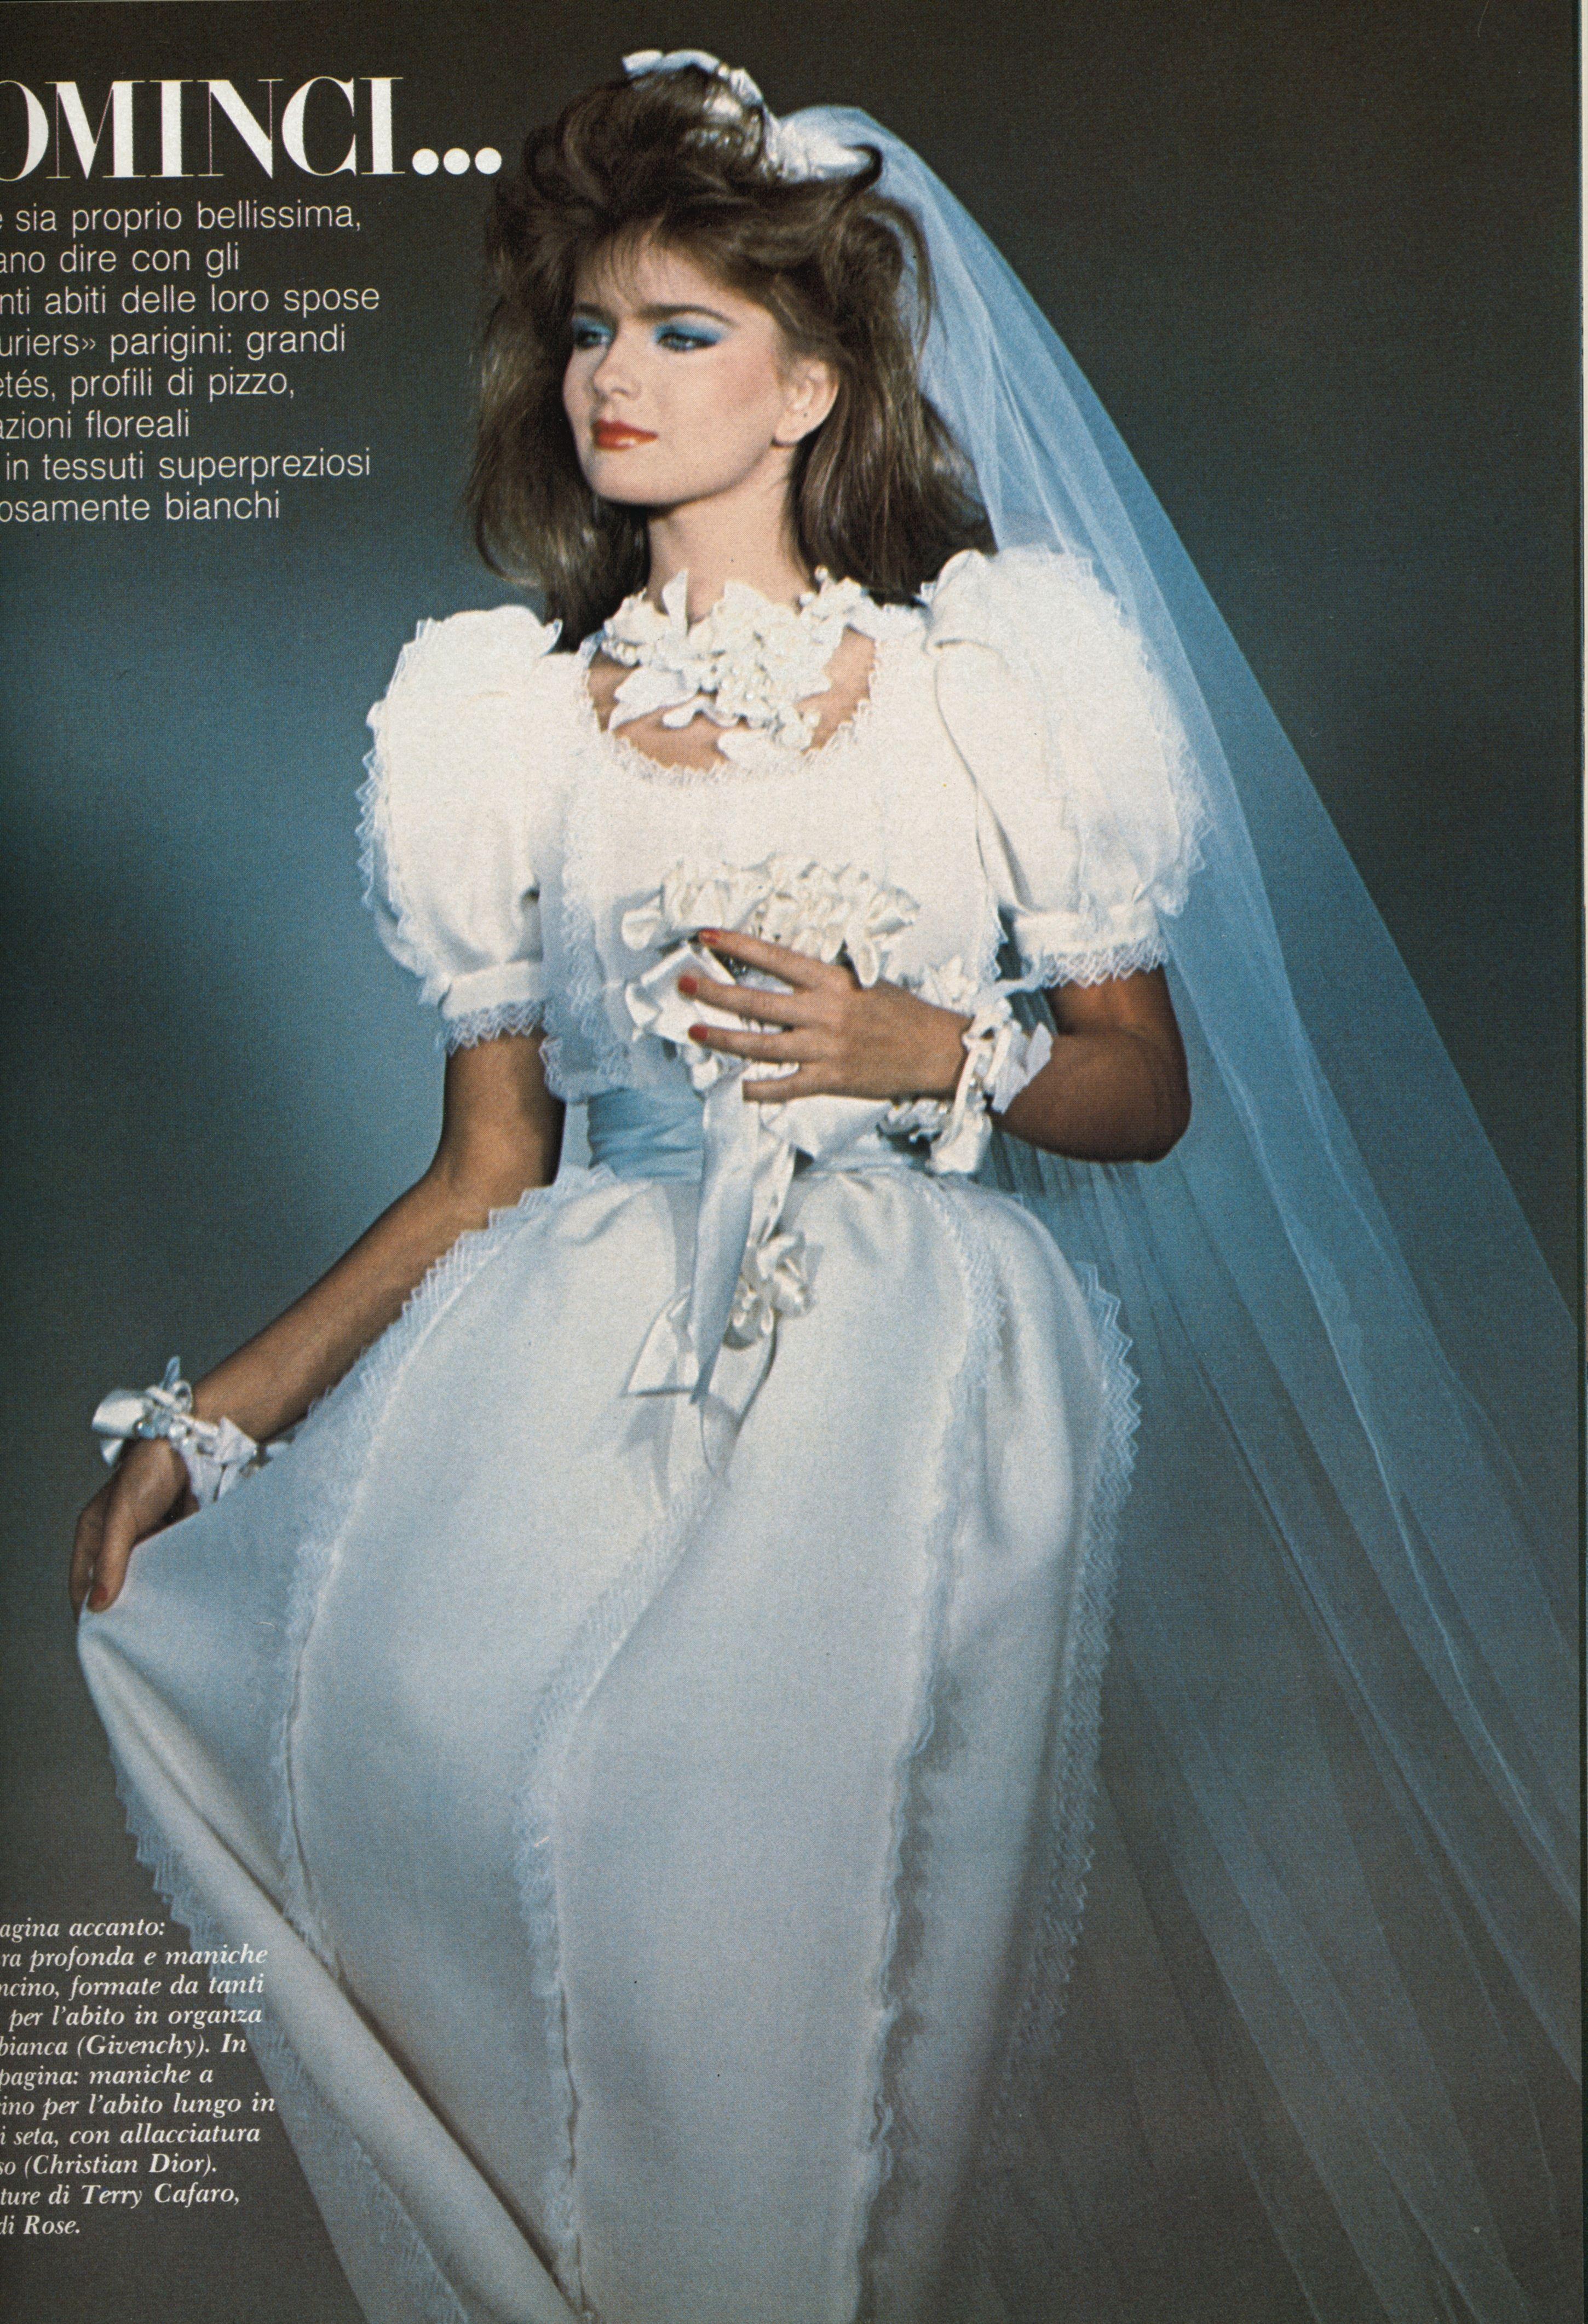 Vogue italy sposa june wedding dresses historyutrends